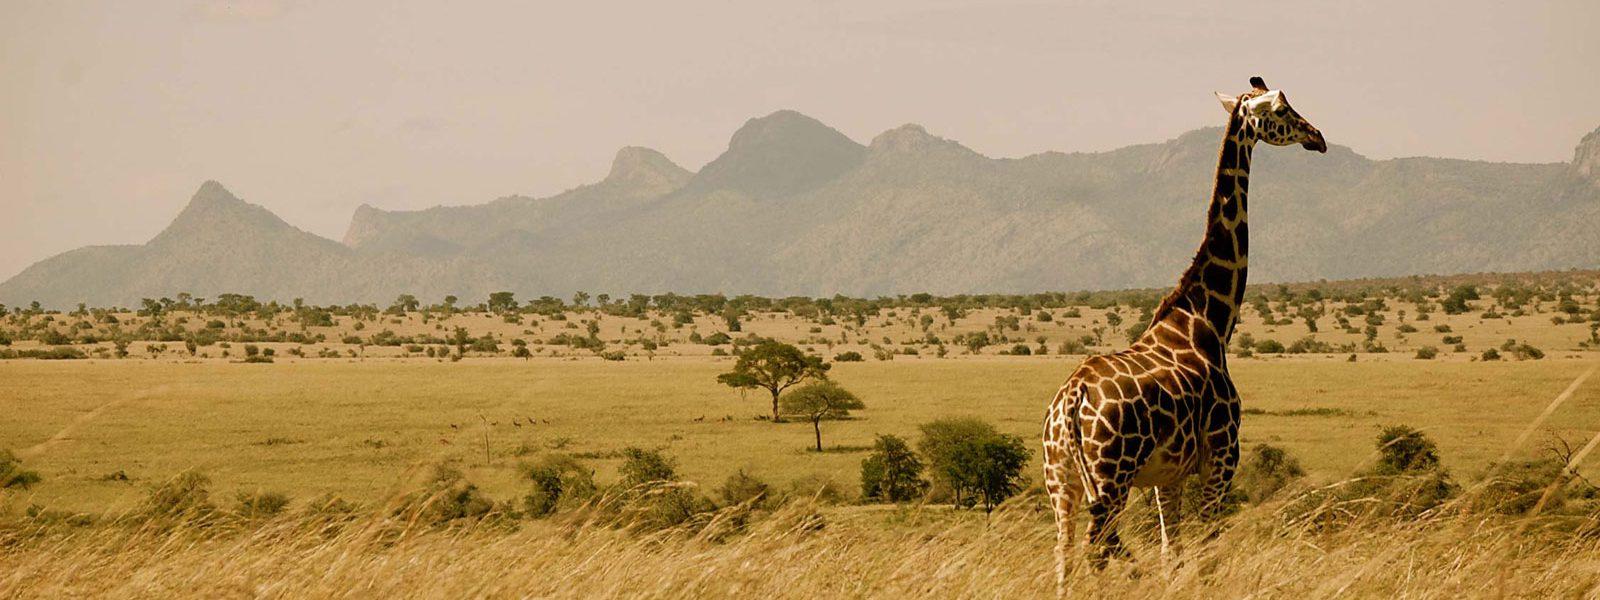 Uganda Safaris Adventure